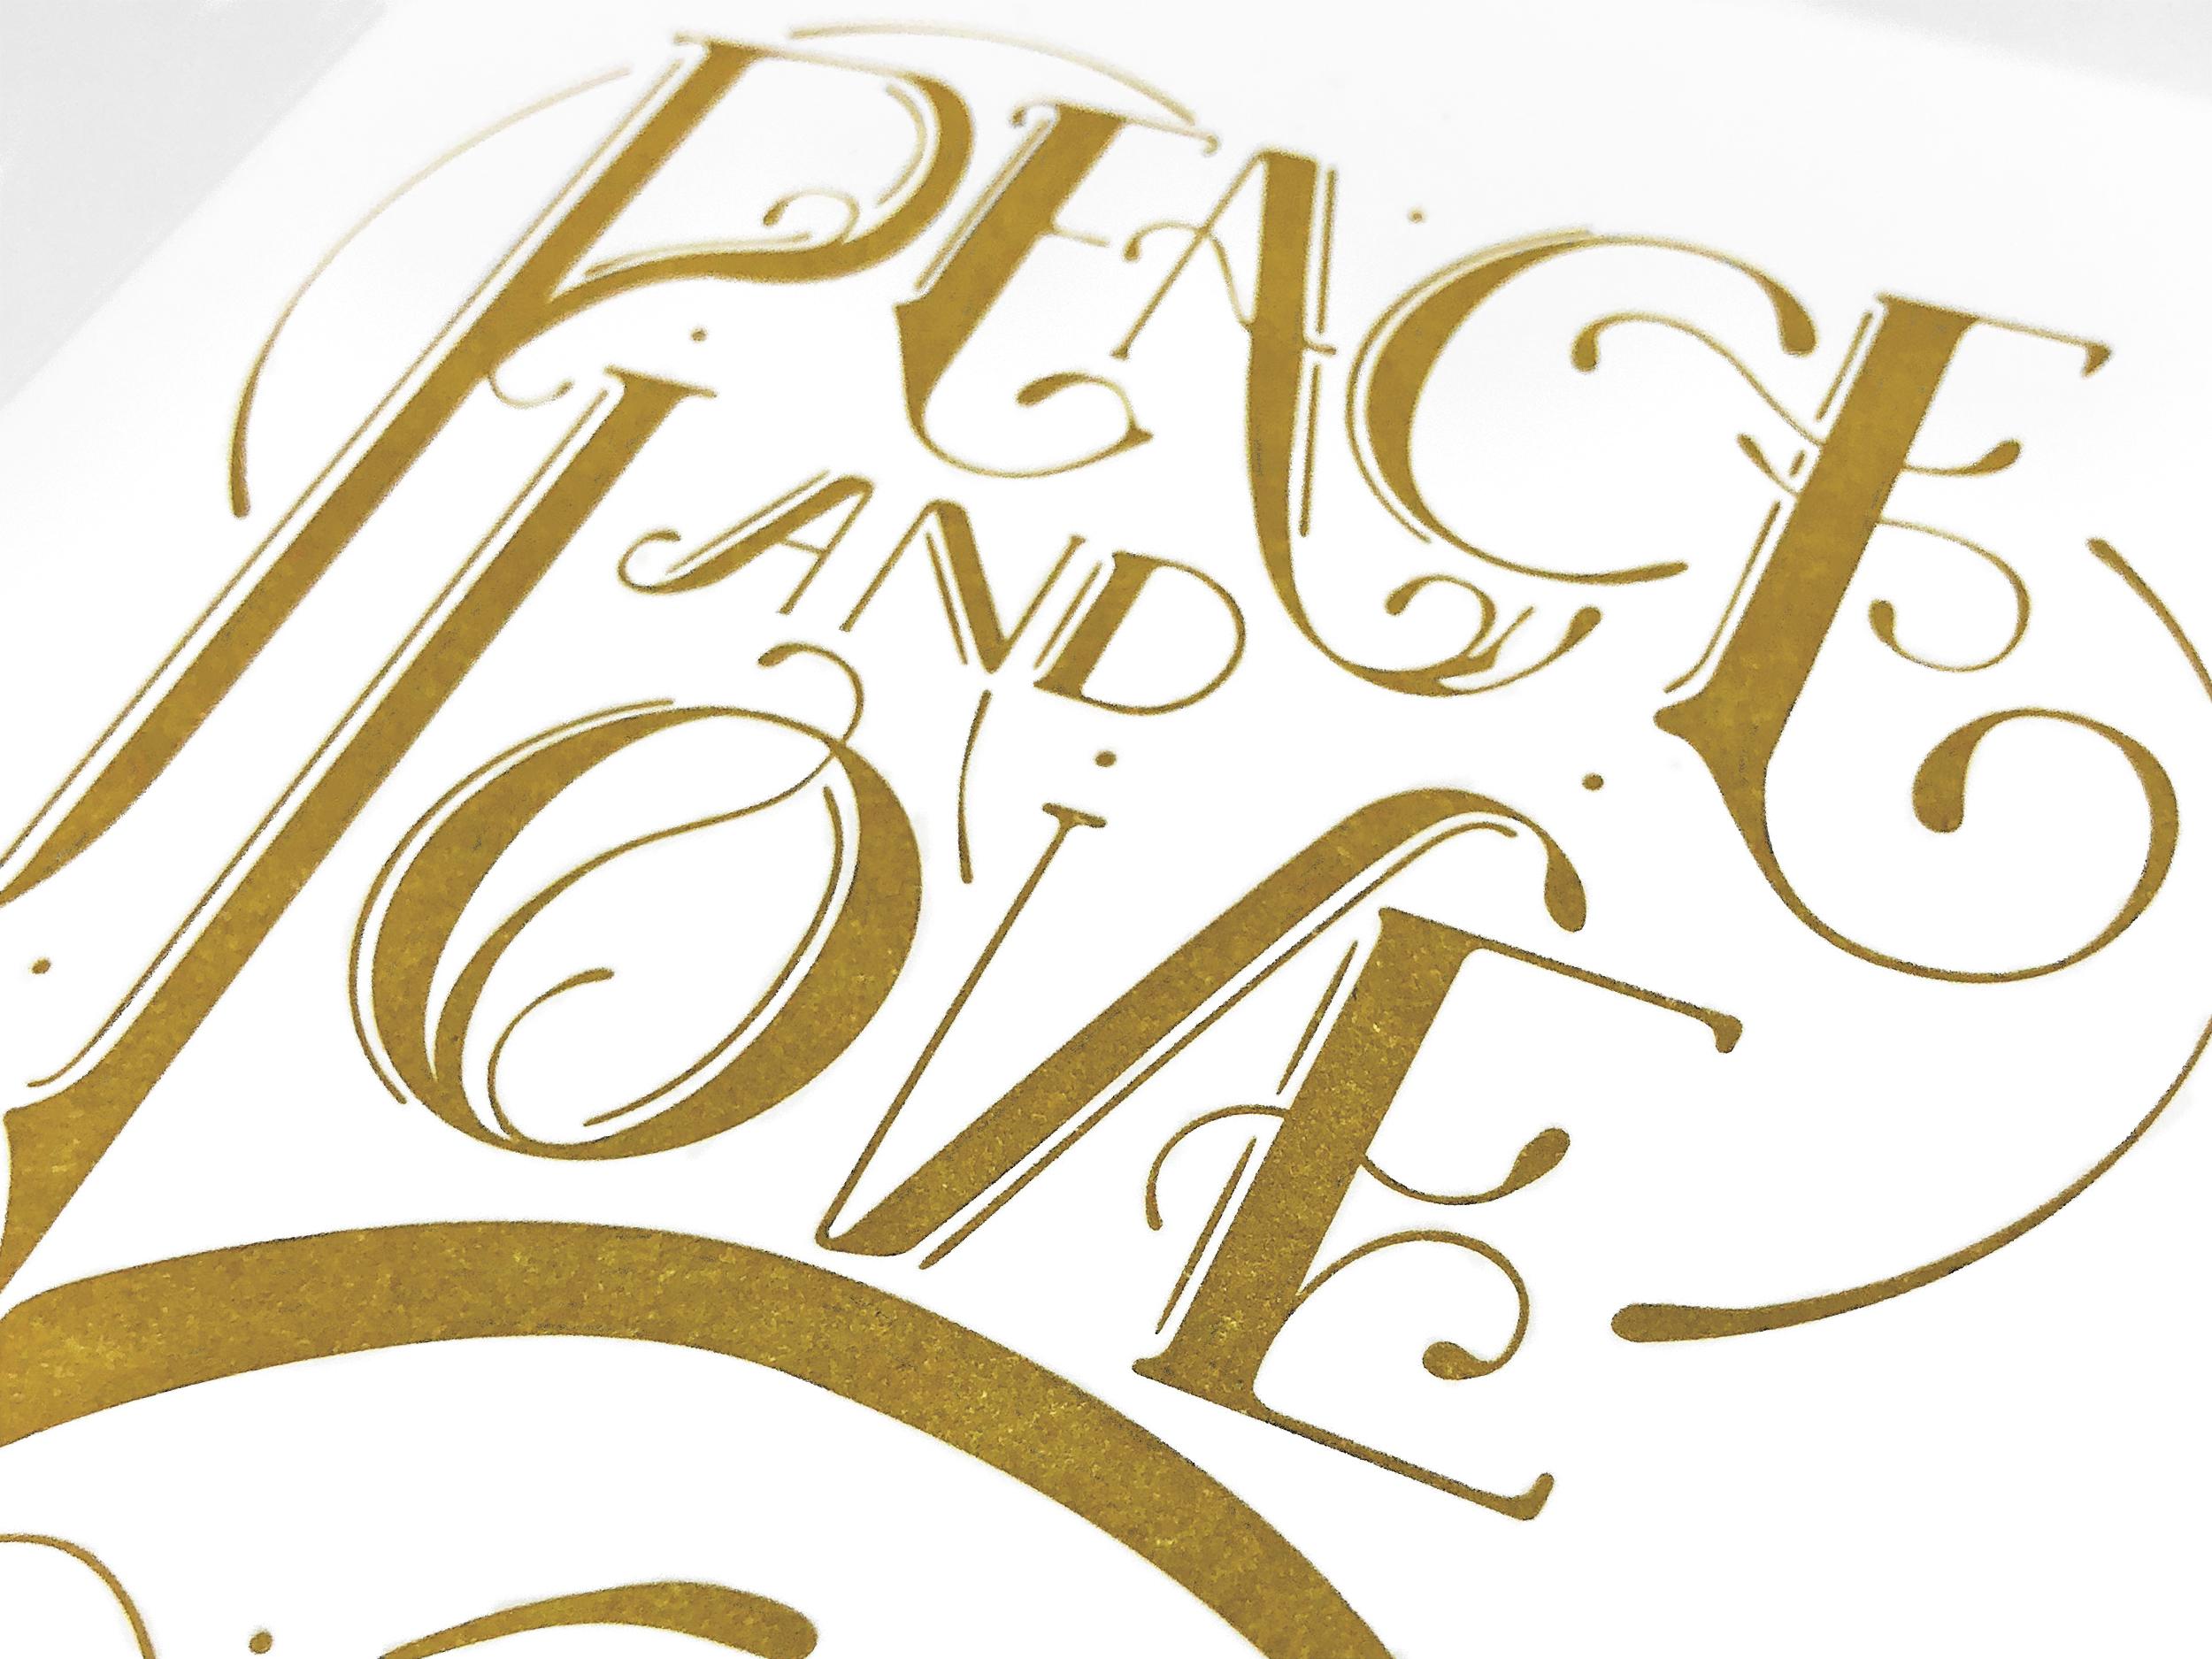 PeaceLove_02.jpg